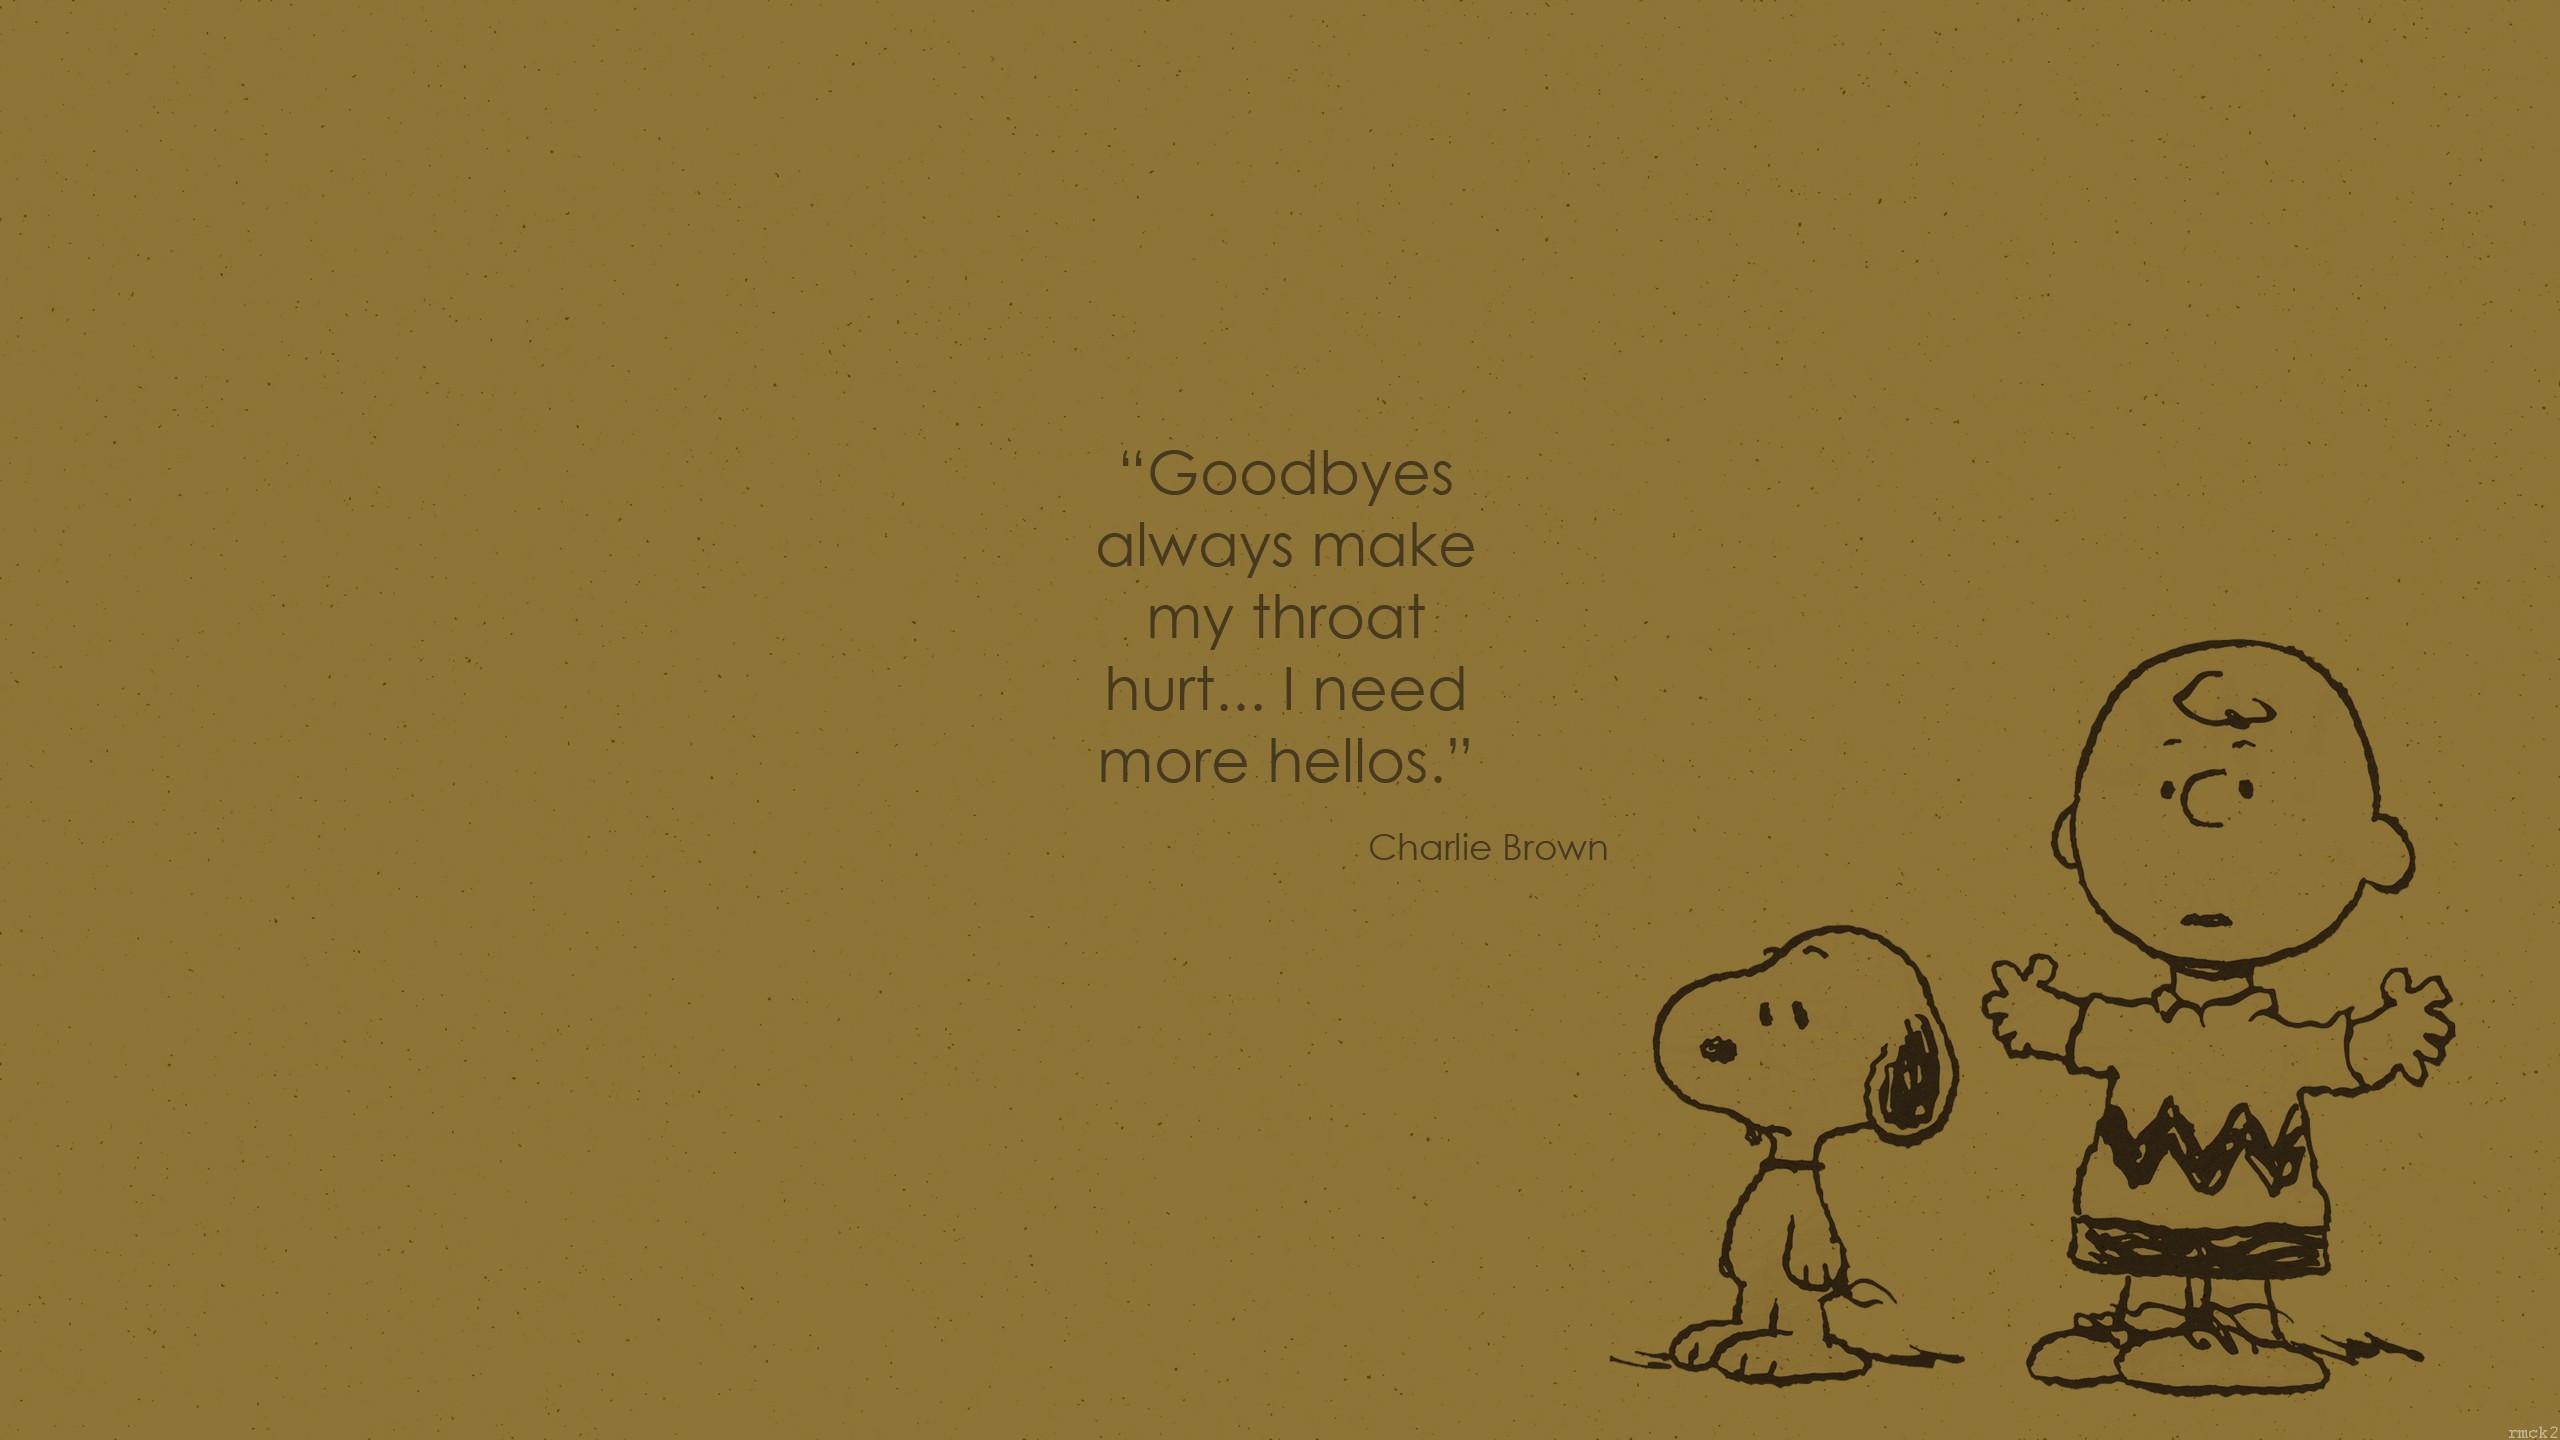 Great Gatsby Quote Wallpaper デスクトップ壁紙 お絵かき 図 見積もり テキスト 漫画 ブランド チャーリー・ブラウン